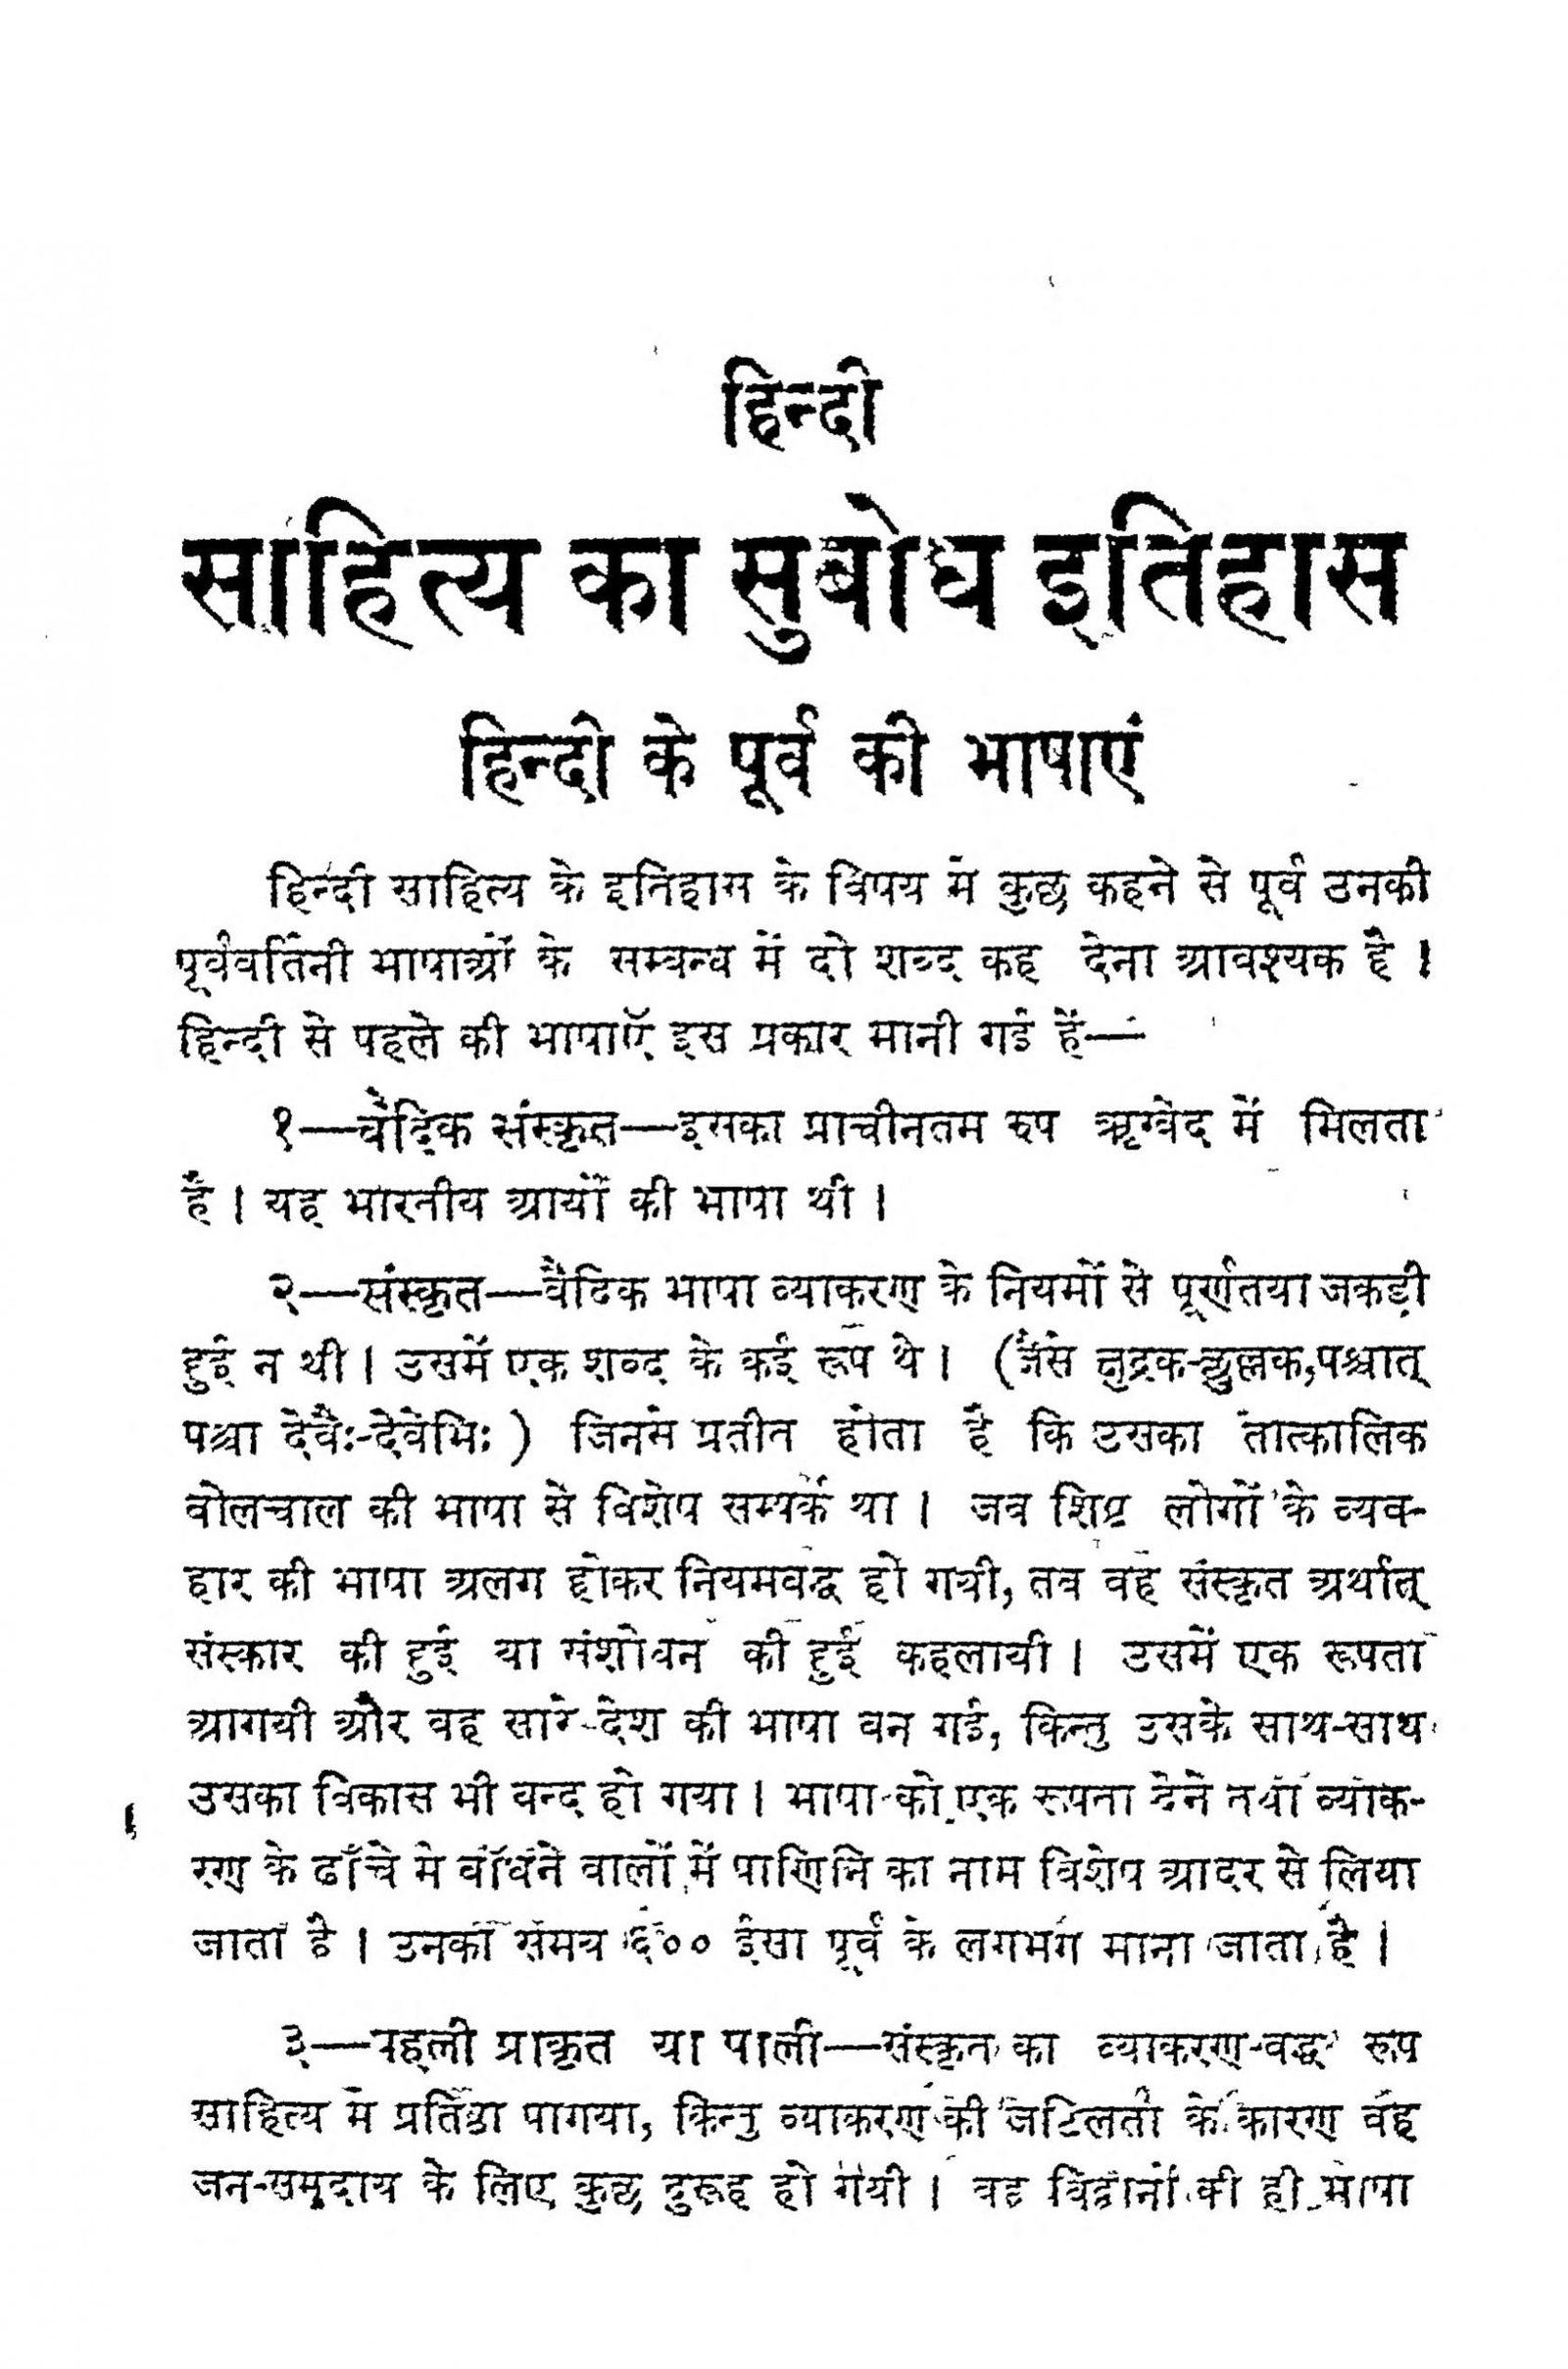 Book Image : हिंदी साहित्य का सुबोध इतिहास - Hindi Sahitya Ka Subodh Itihas